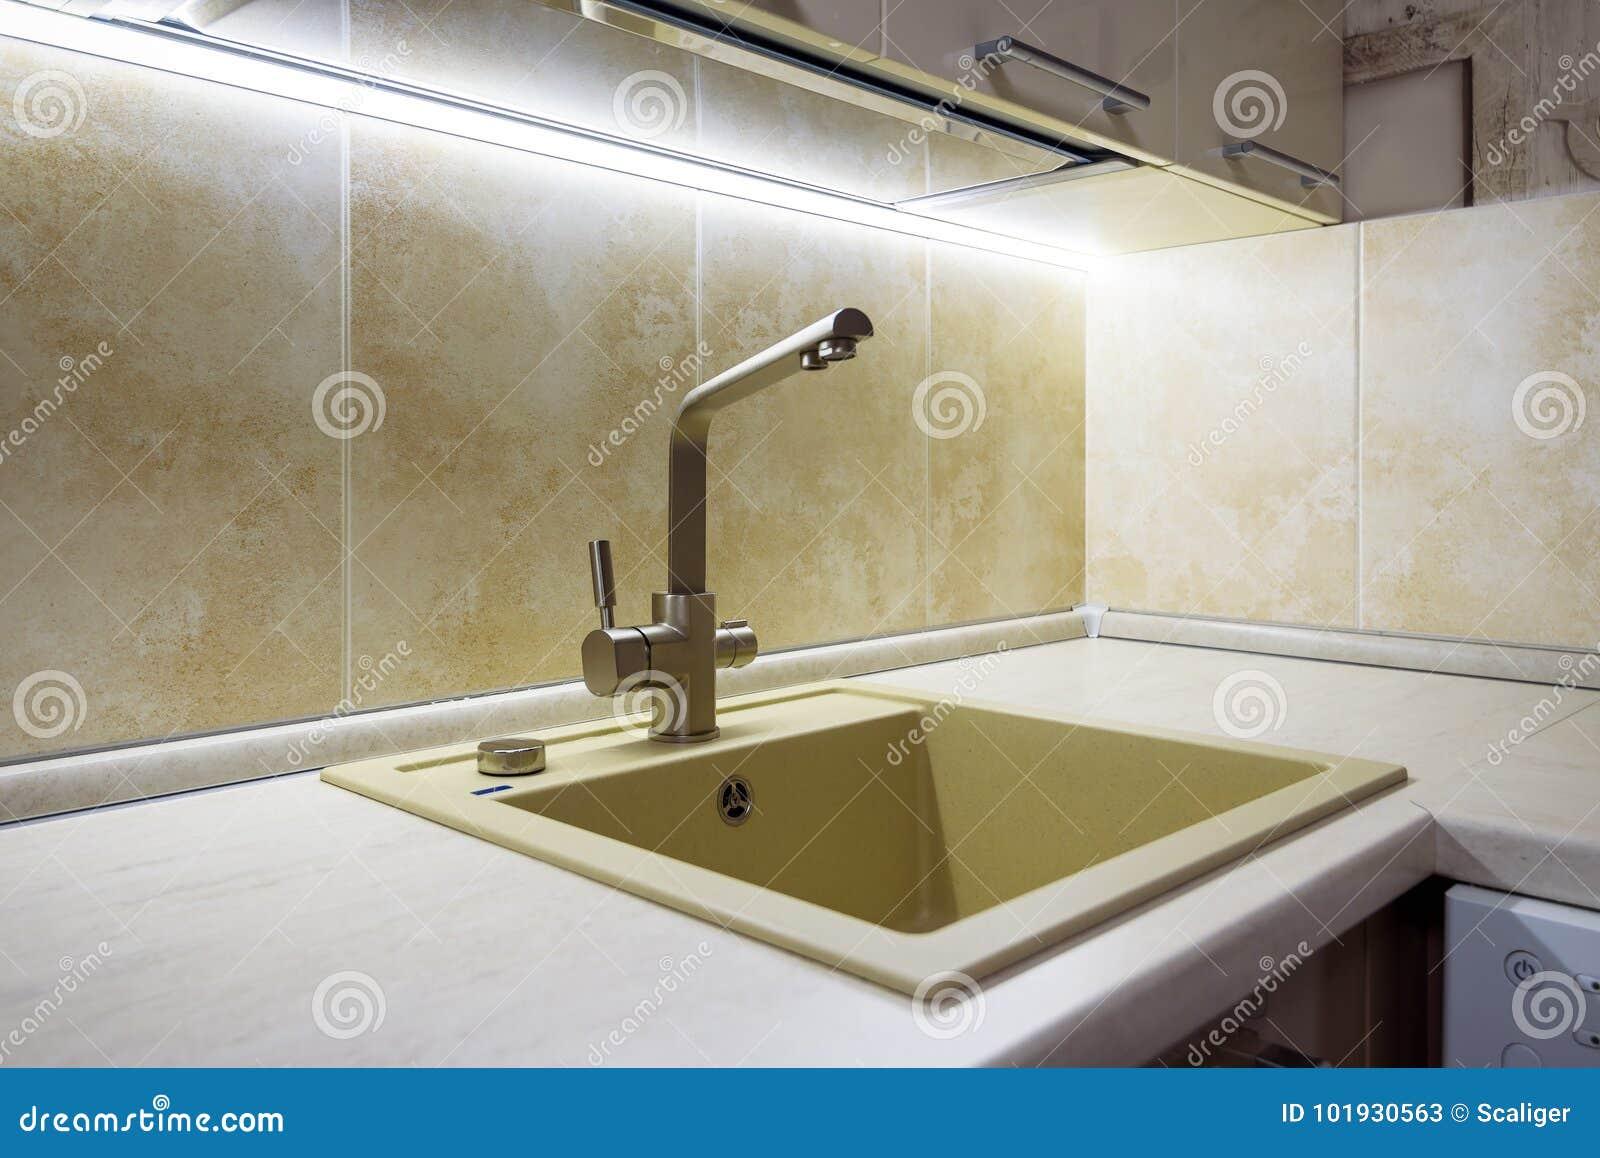 Modern Kitchen Sink Stock Image Image Of Illumination 101930563